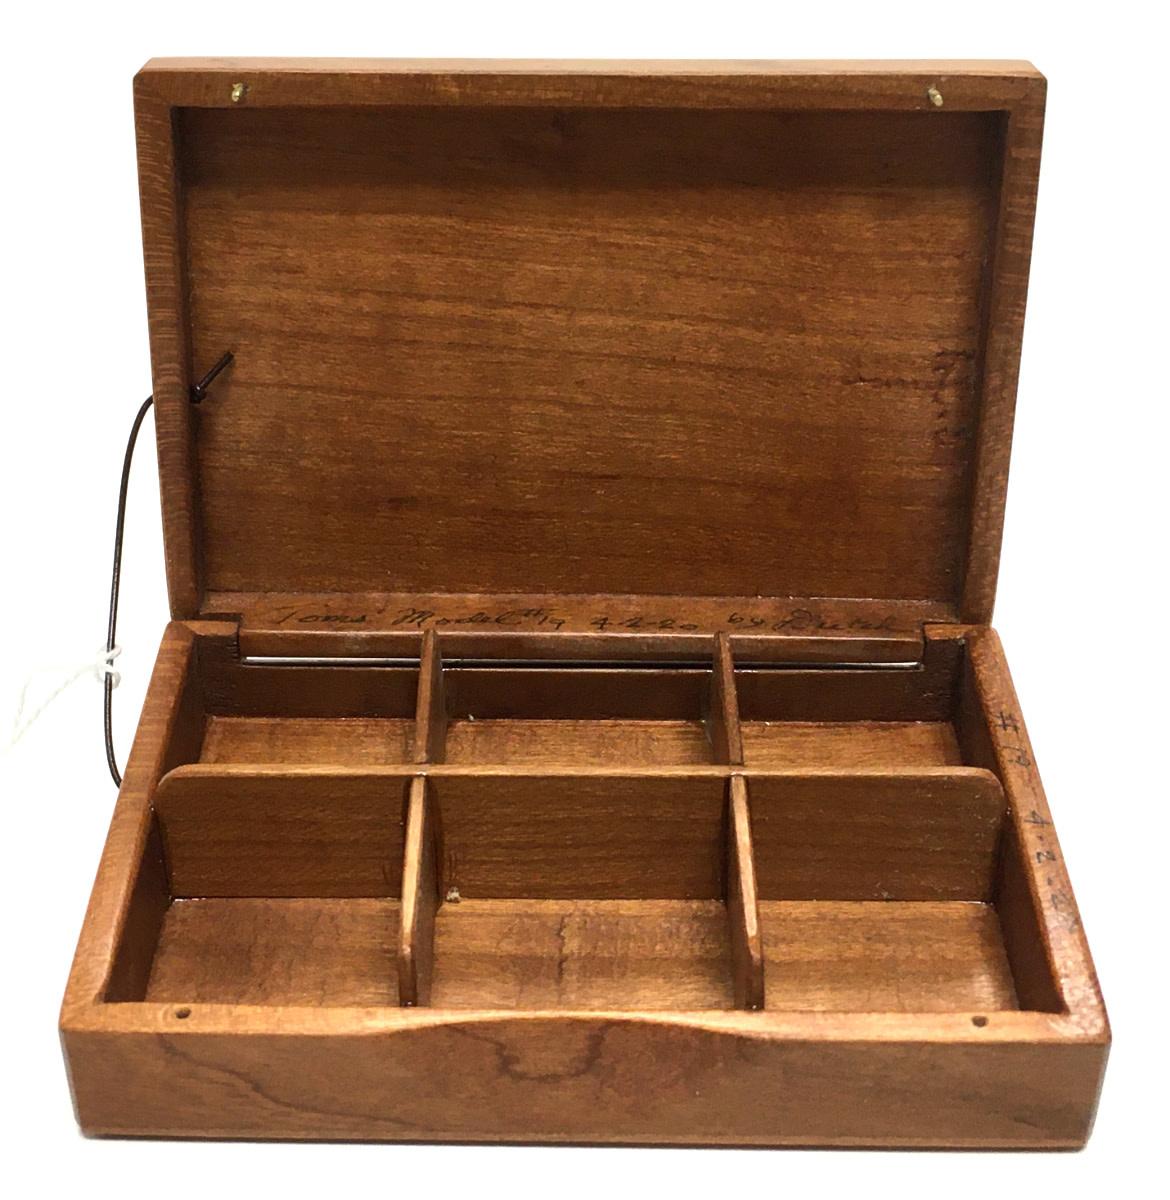 Dutch Box - Tom's Model #19 - Cherry